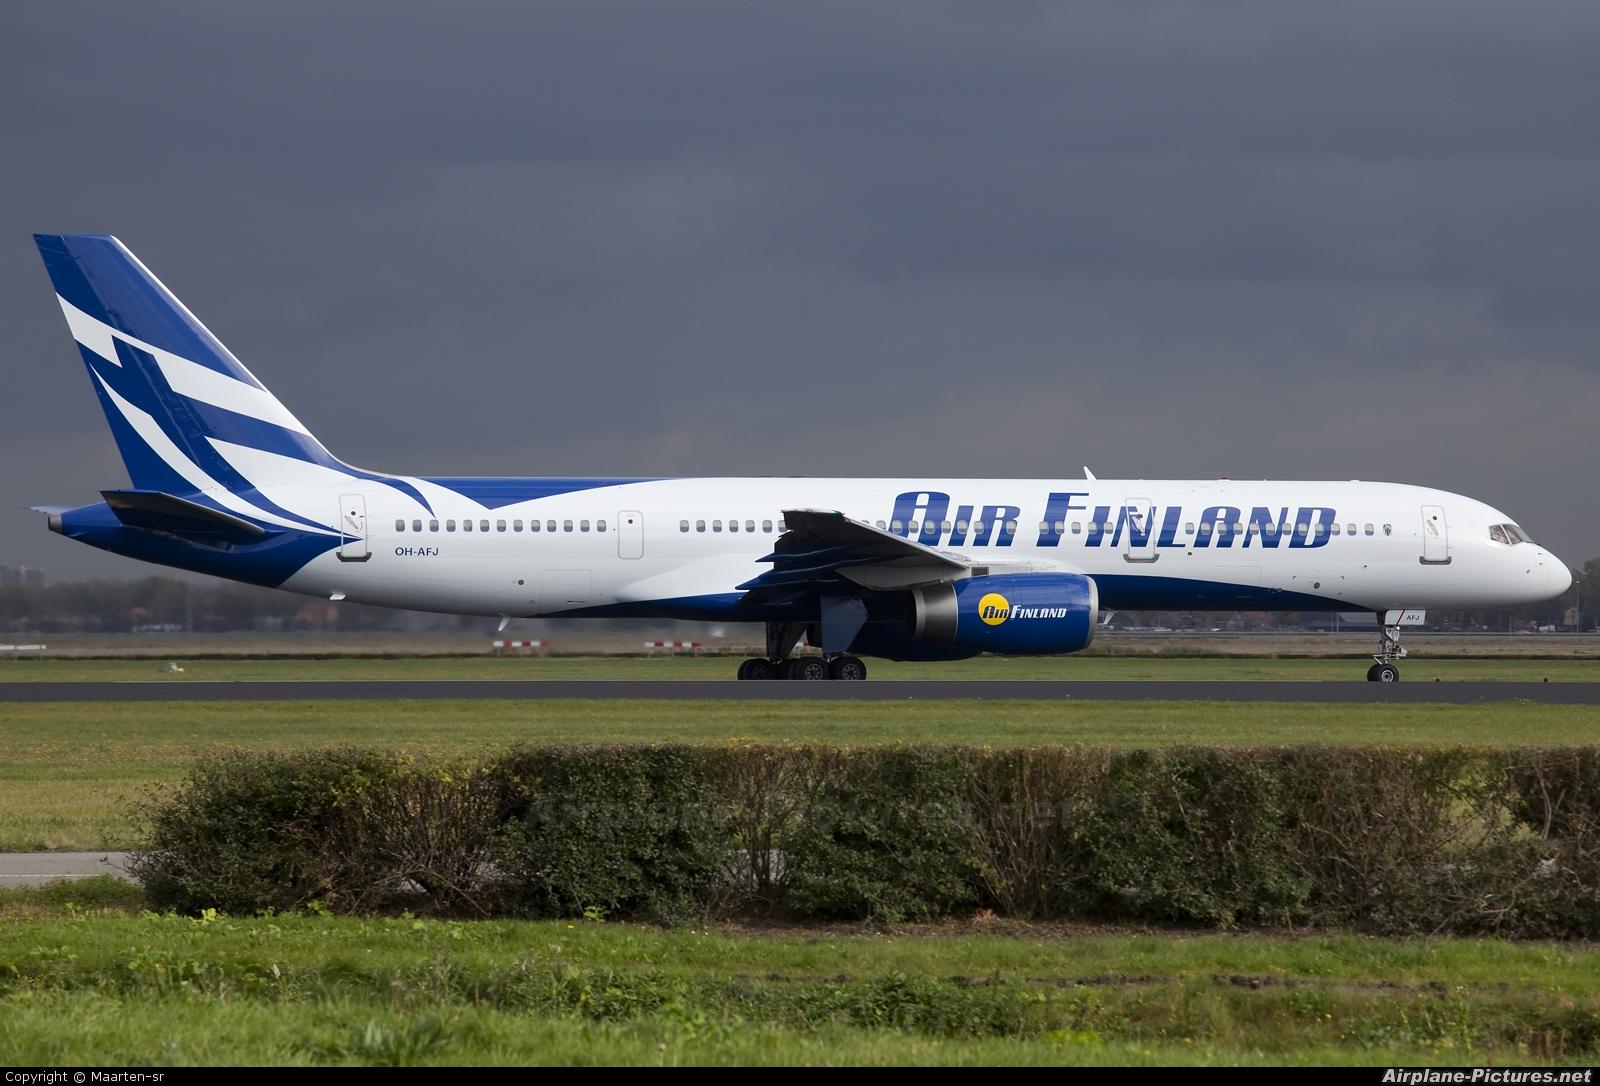 Air Finland OH-AFJ aircraft at Amsterdam - Schiphol